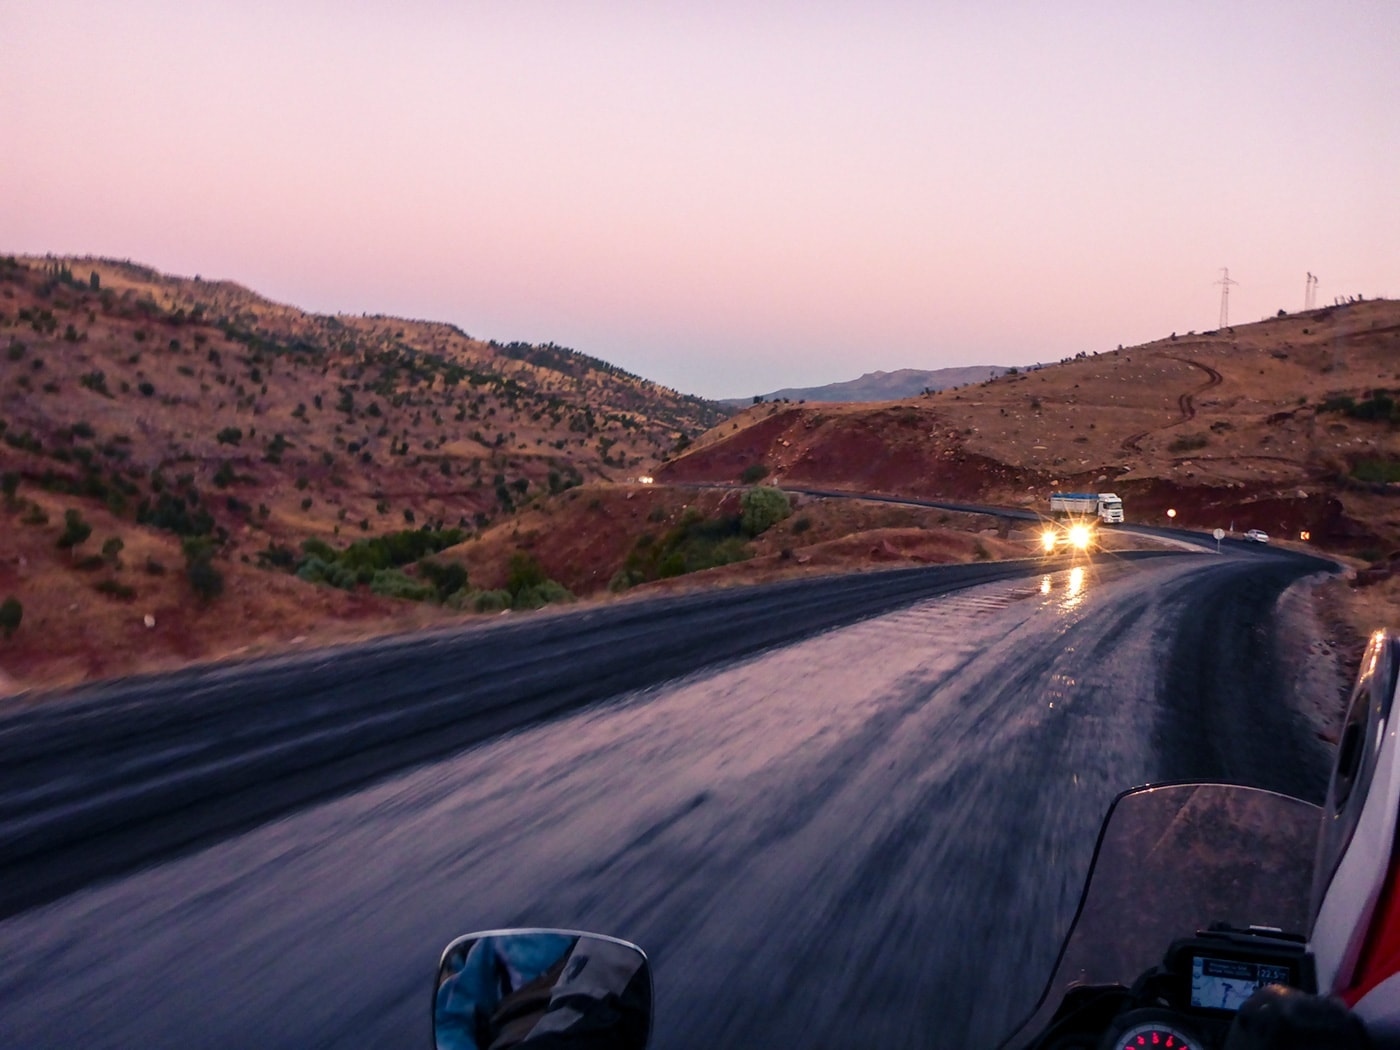 popolo curdo asfalto appena steso